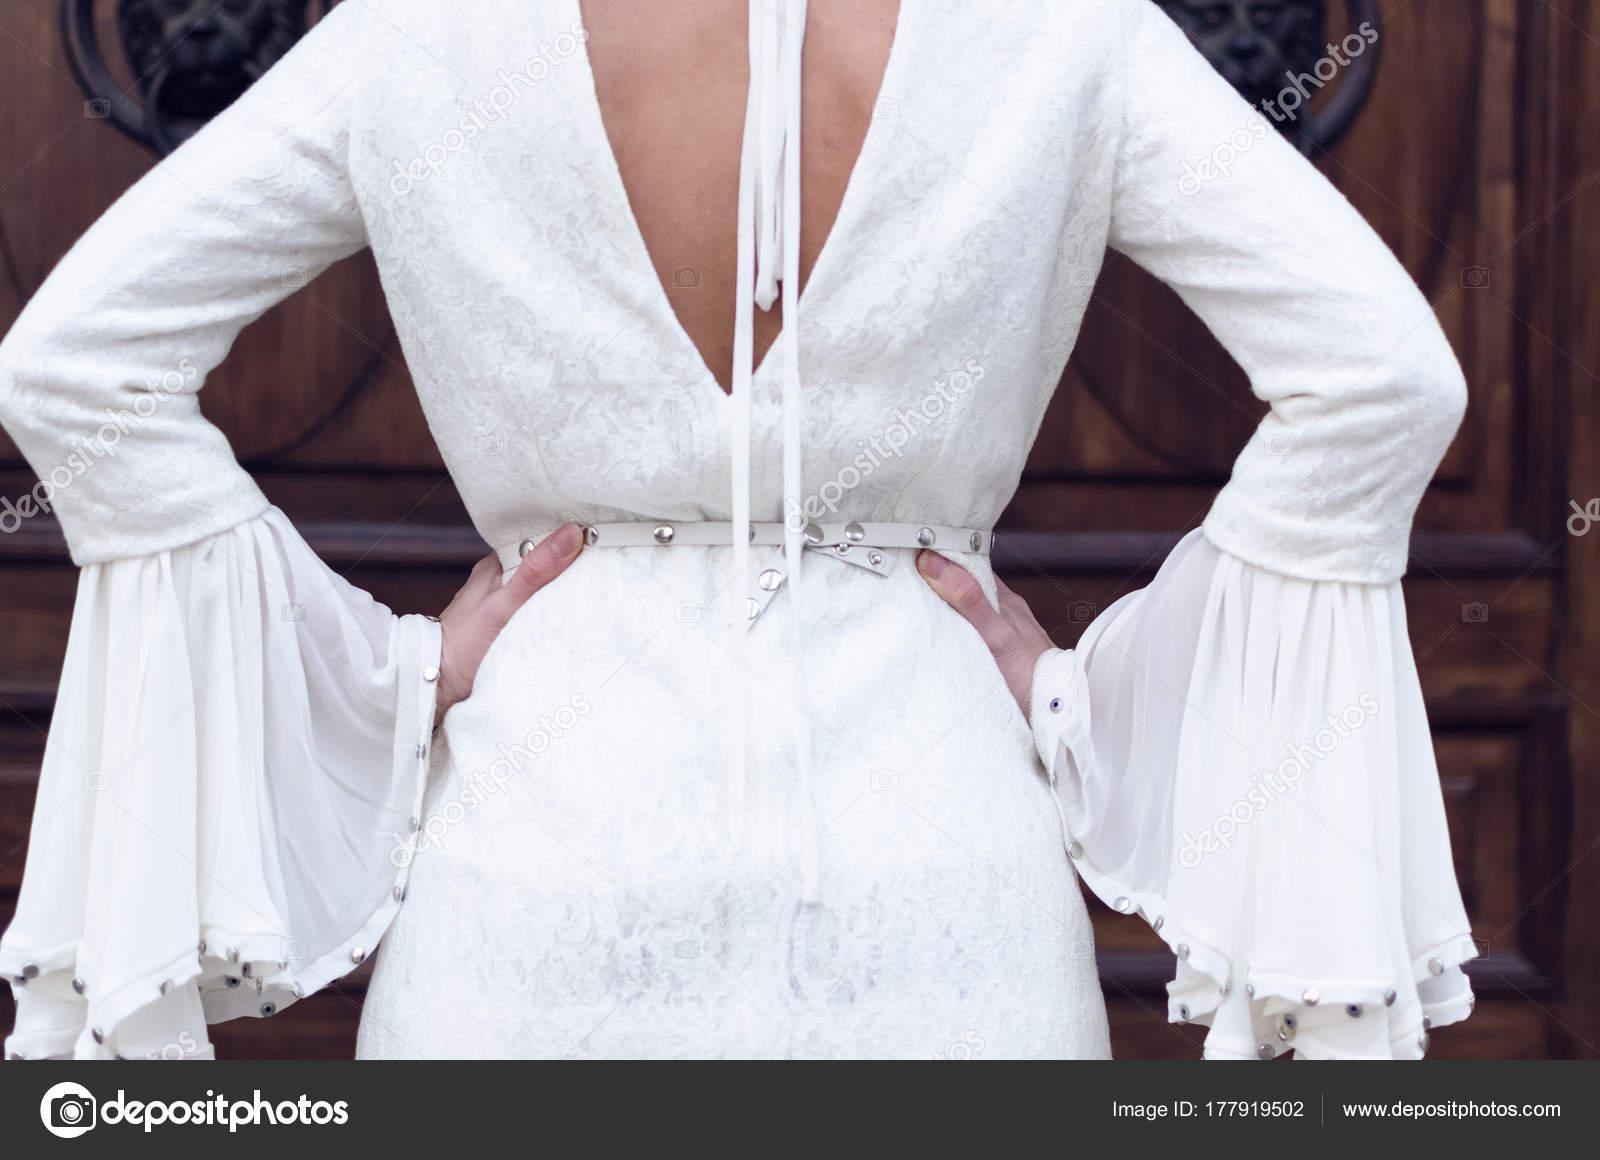 b5ffd9328204 Πίσω Όψη Της Μόδας Νεαρή Γυναίκα Στο Μακρύ Λευκό Φόρεμα — Φωτογραφία Αρχείου